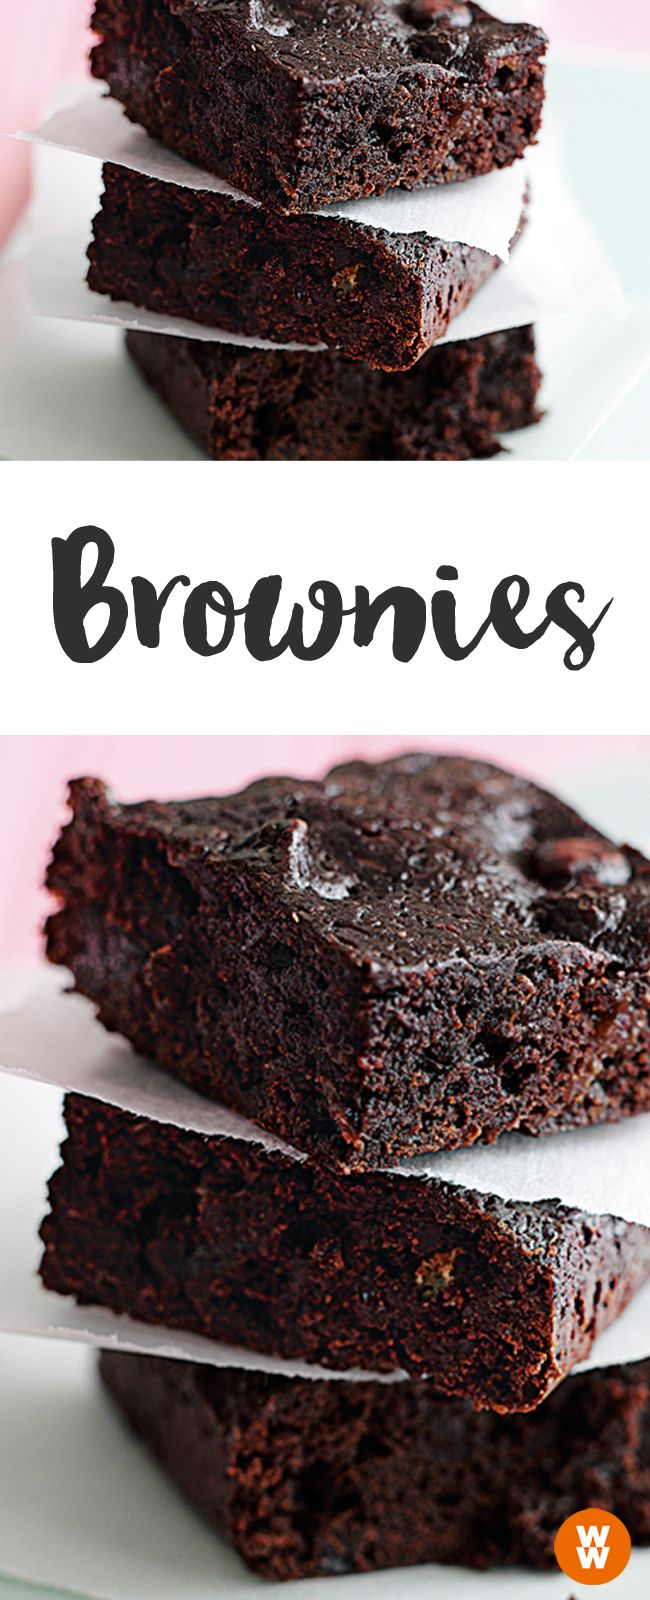 Brownie, Brownies, Rezept, Schokokuchen | Weight Watchers